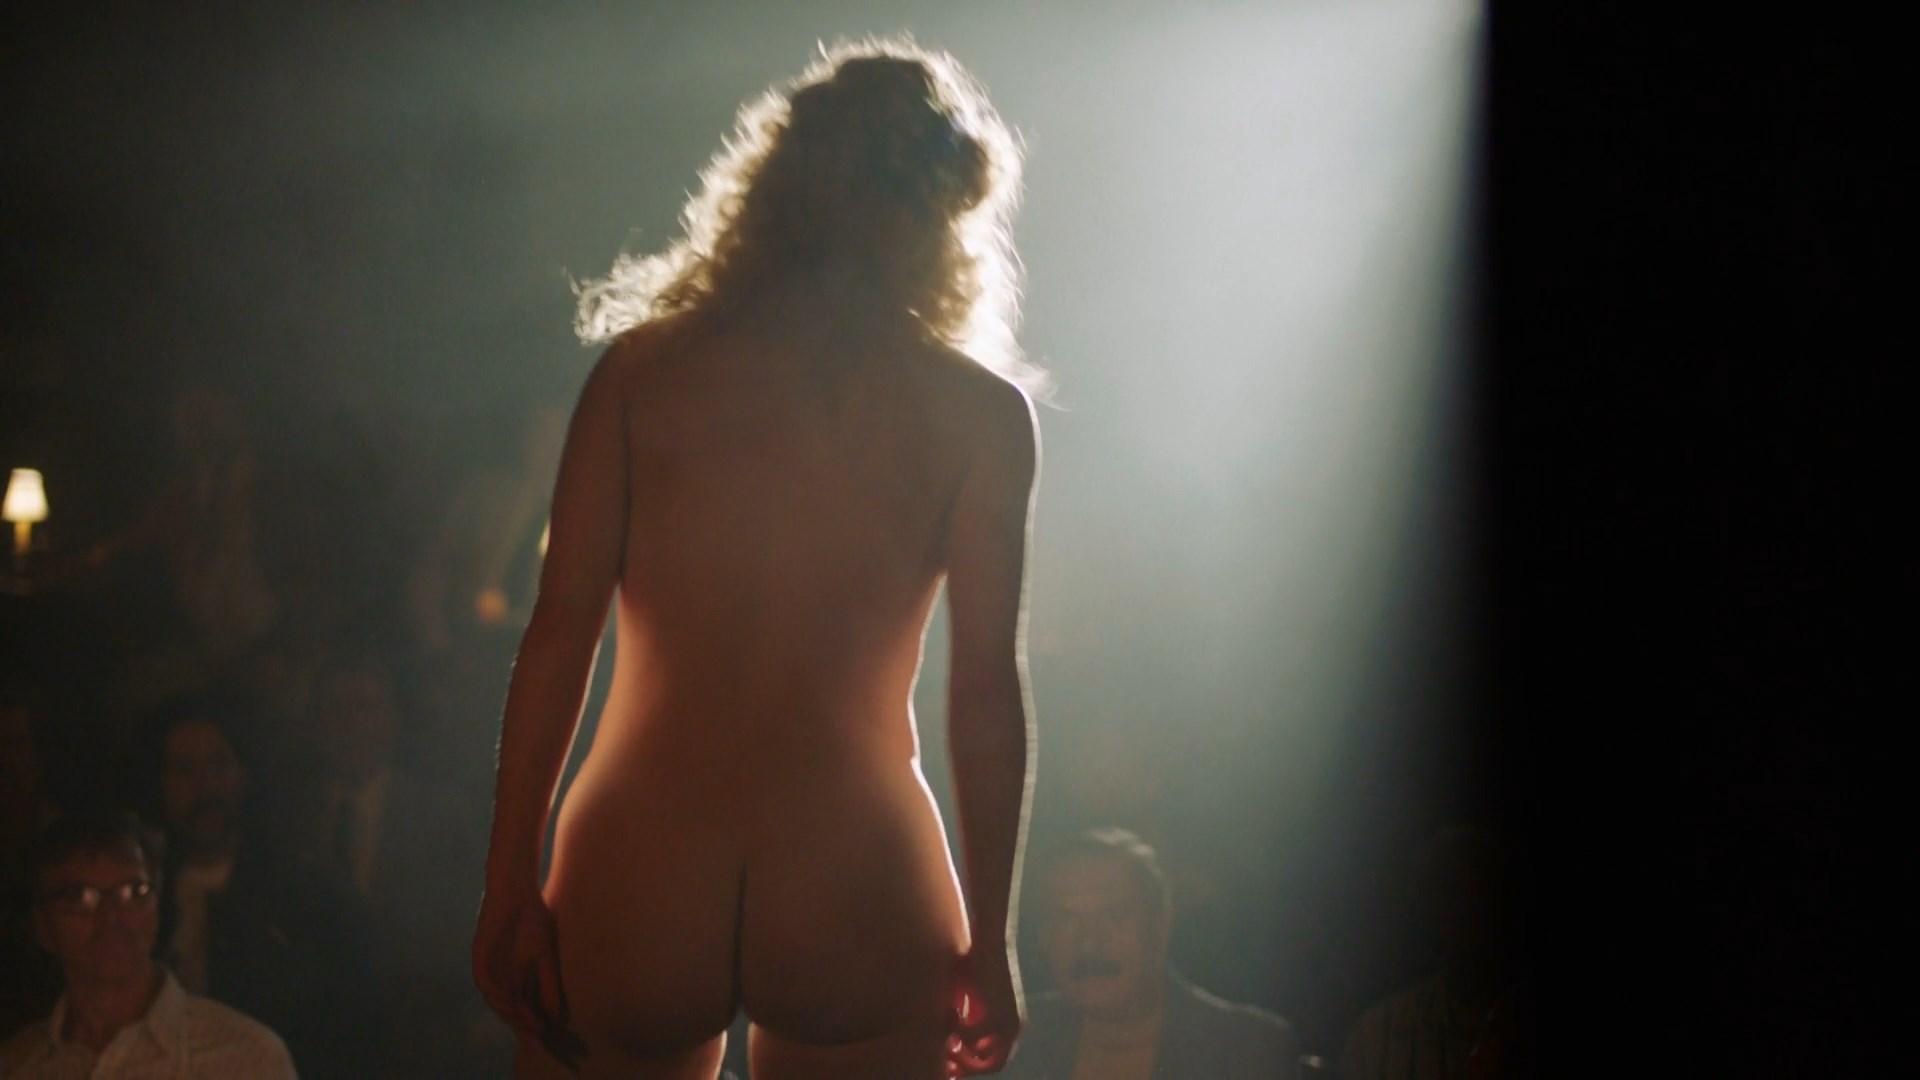 Nudes Kat Cunning naked (87 photo), Ass, Fappening, Instagram, butt 2017